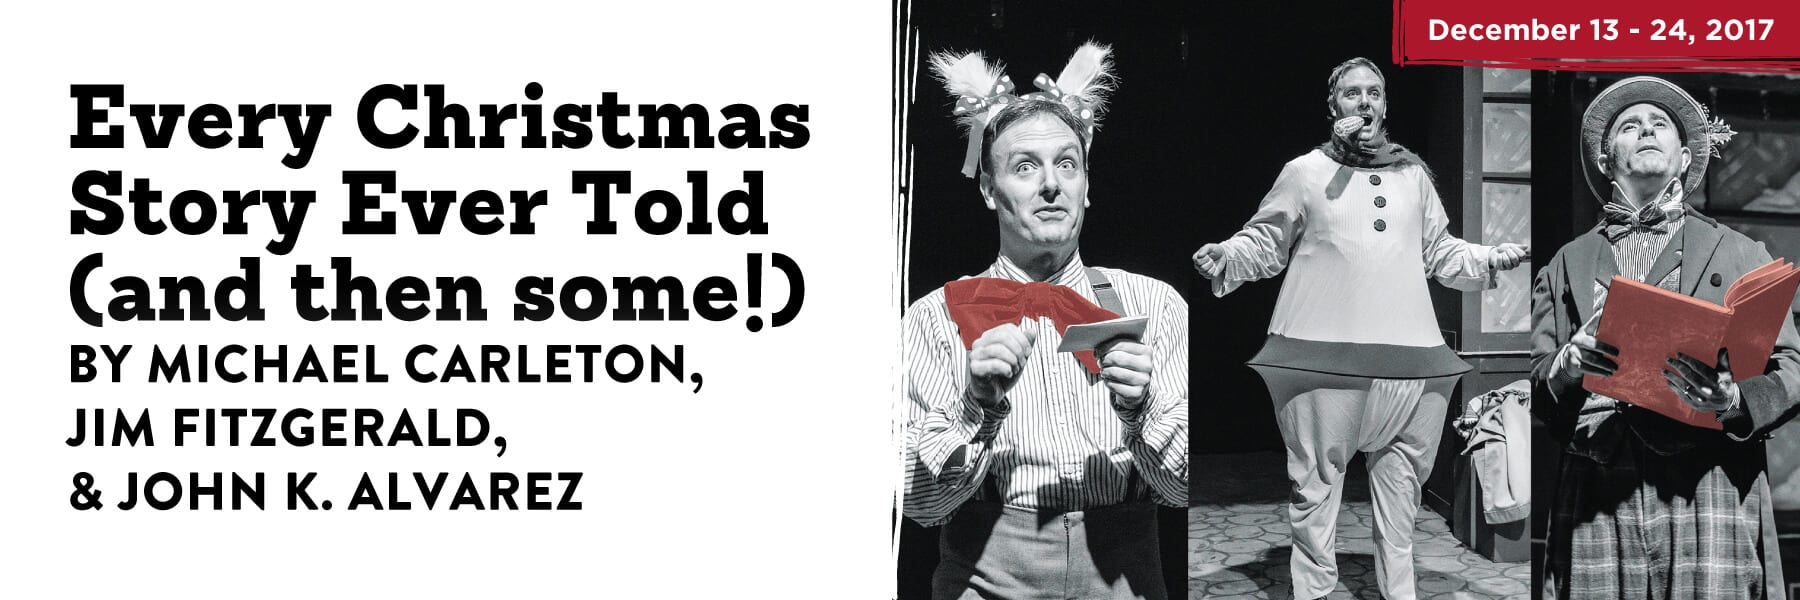 Christmas_banner_final_betc_slider